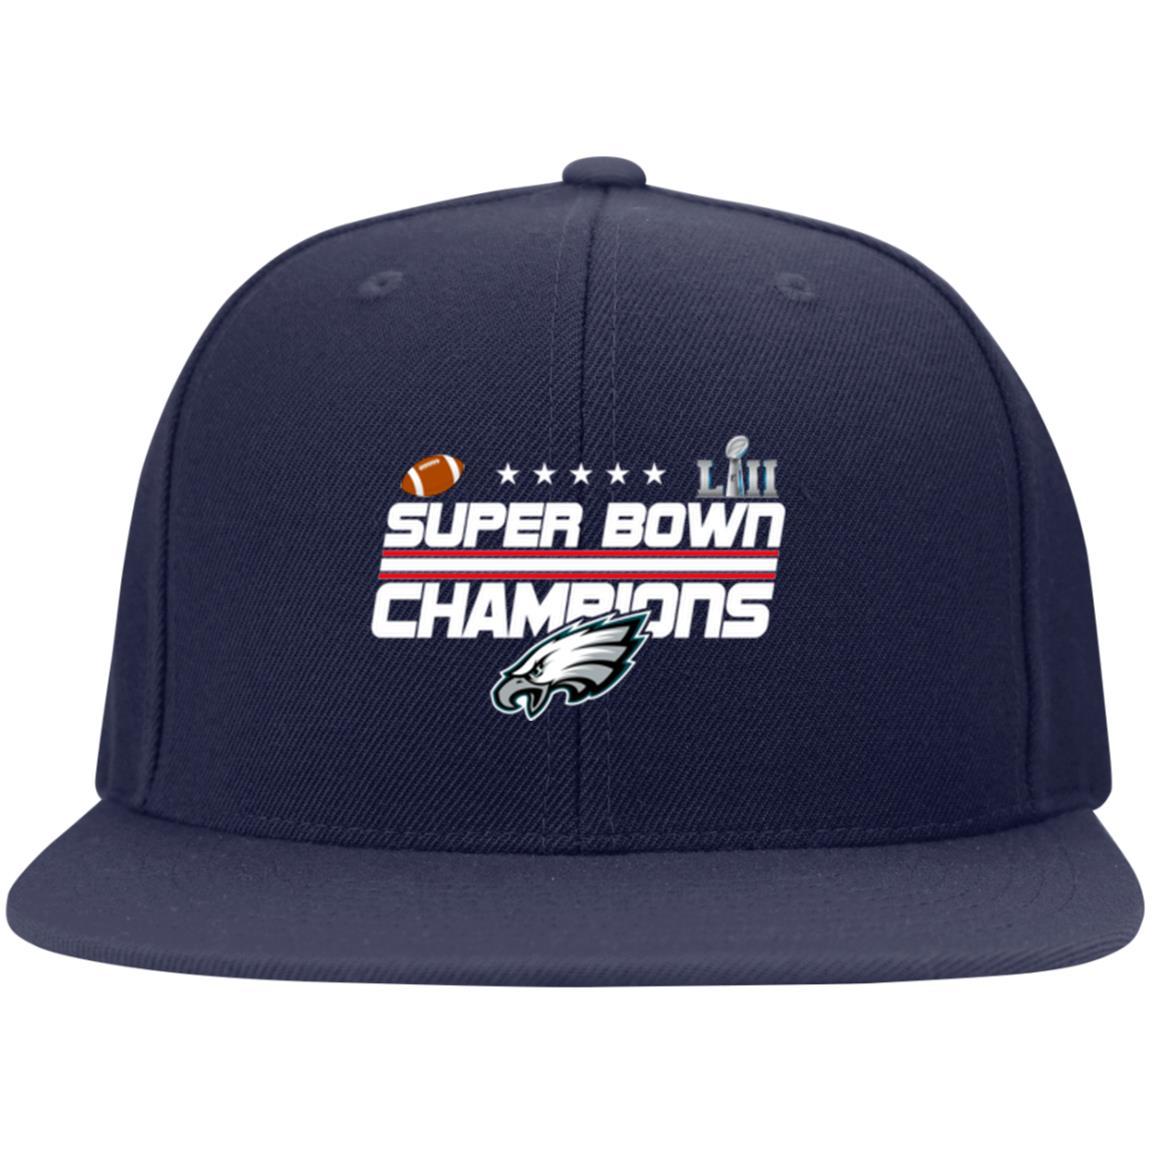 image 263 - Eagles Super Bowl Champions Hats